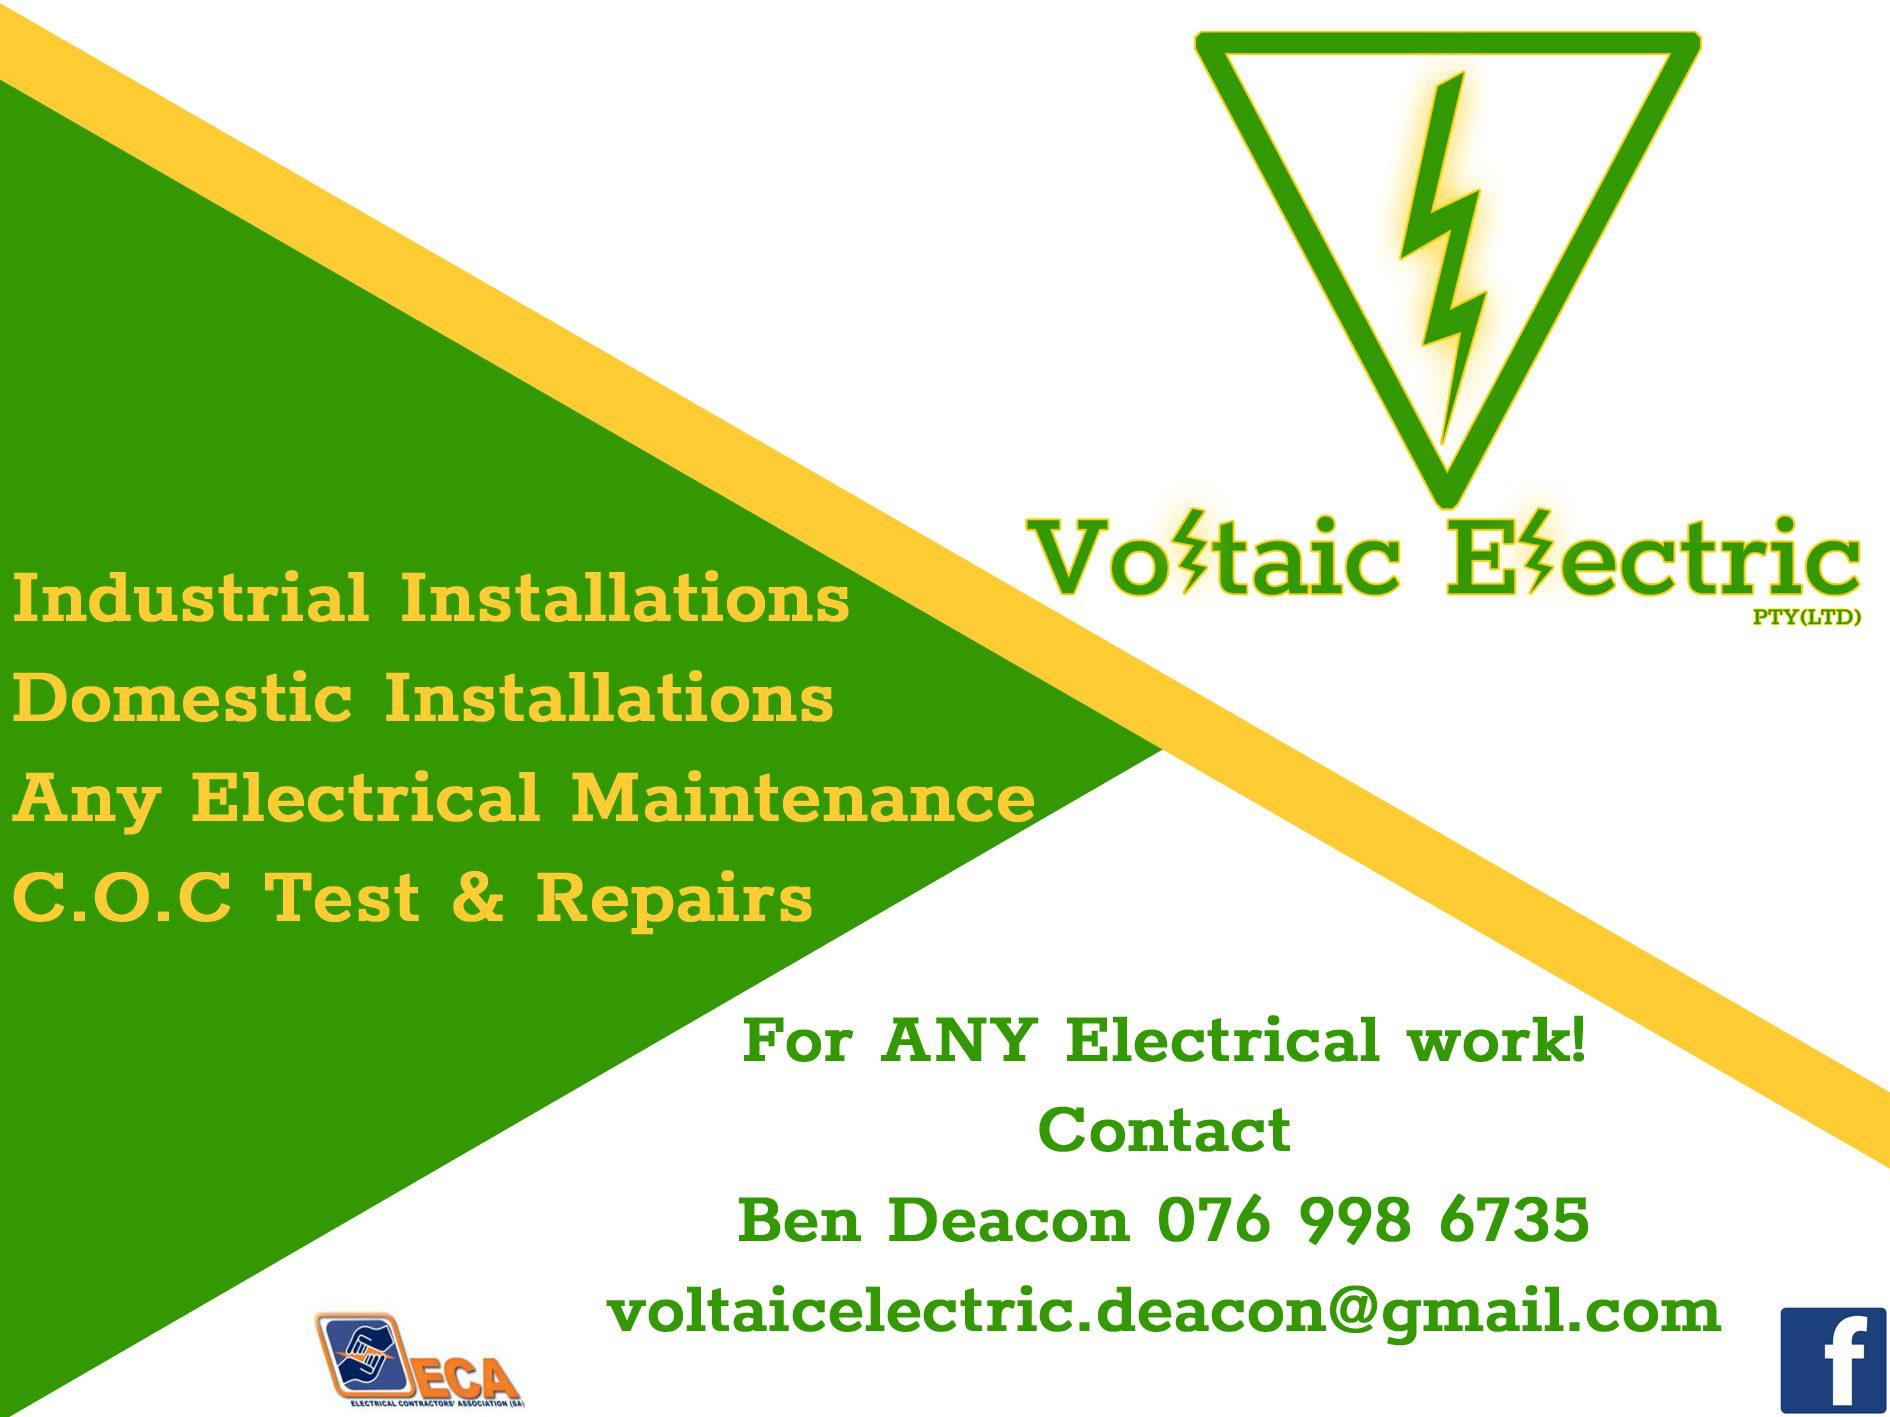 Voltaic Electric Ad